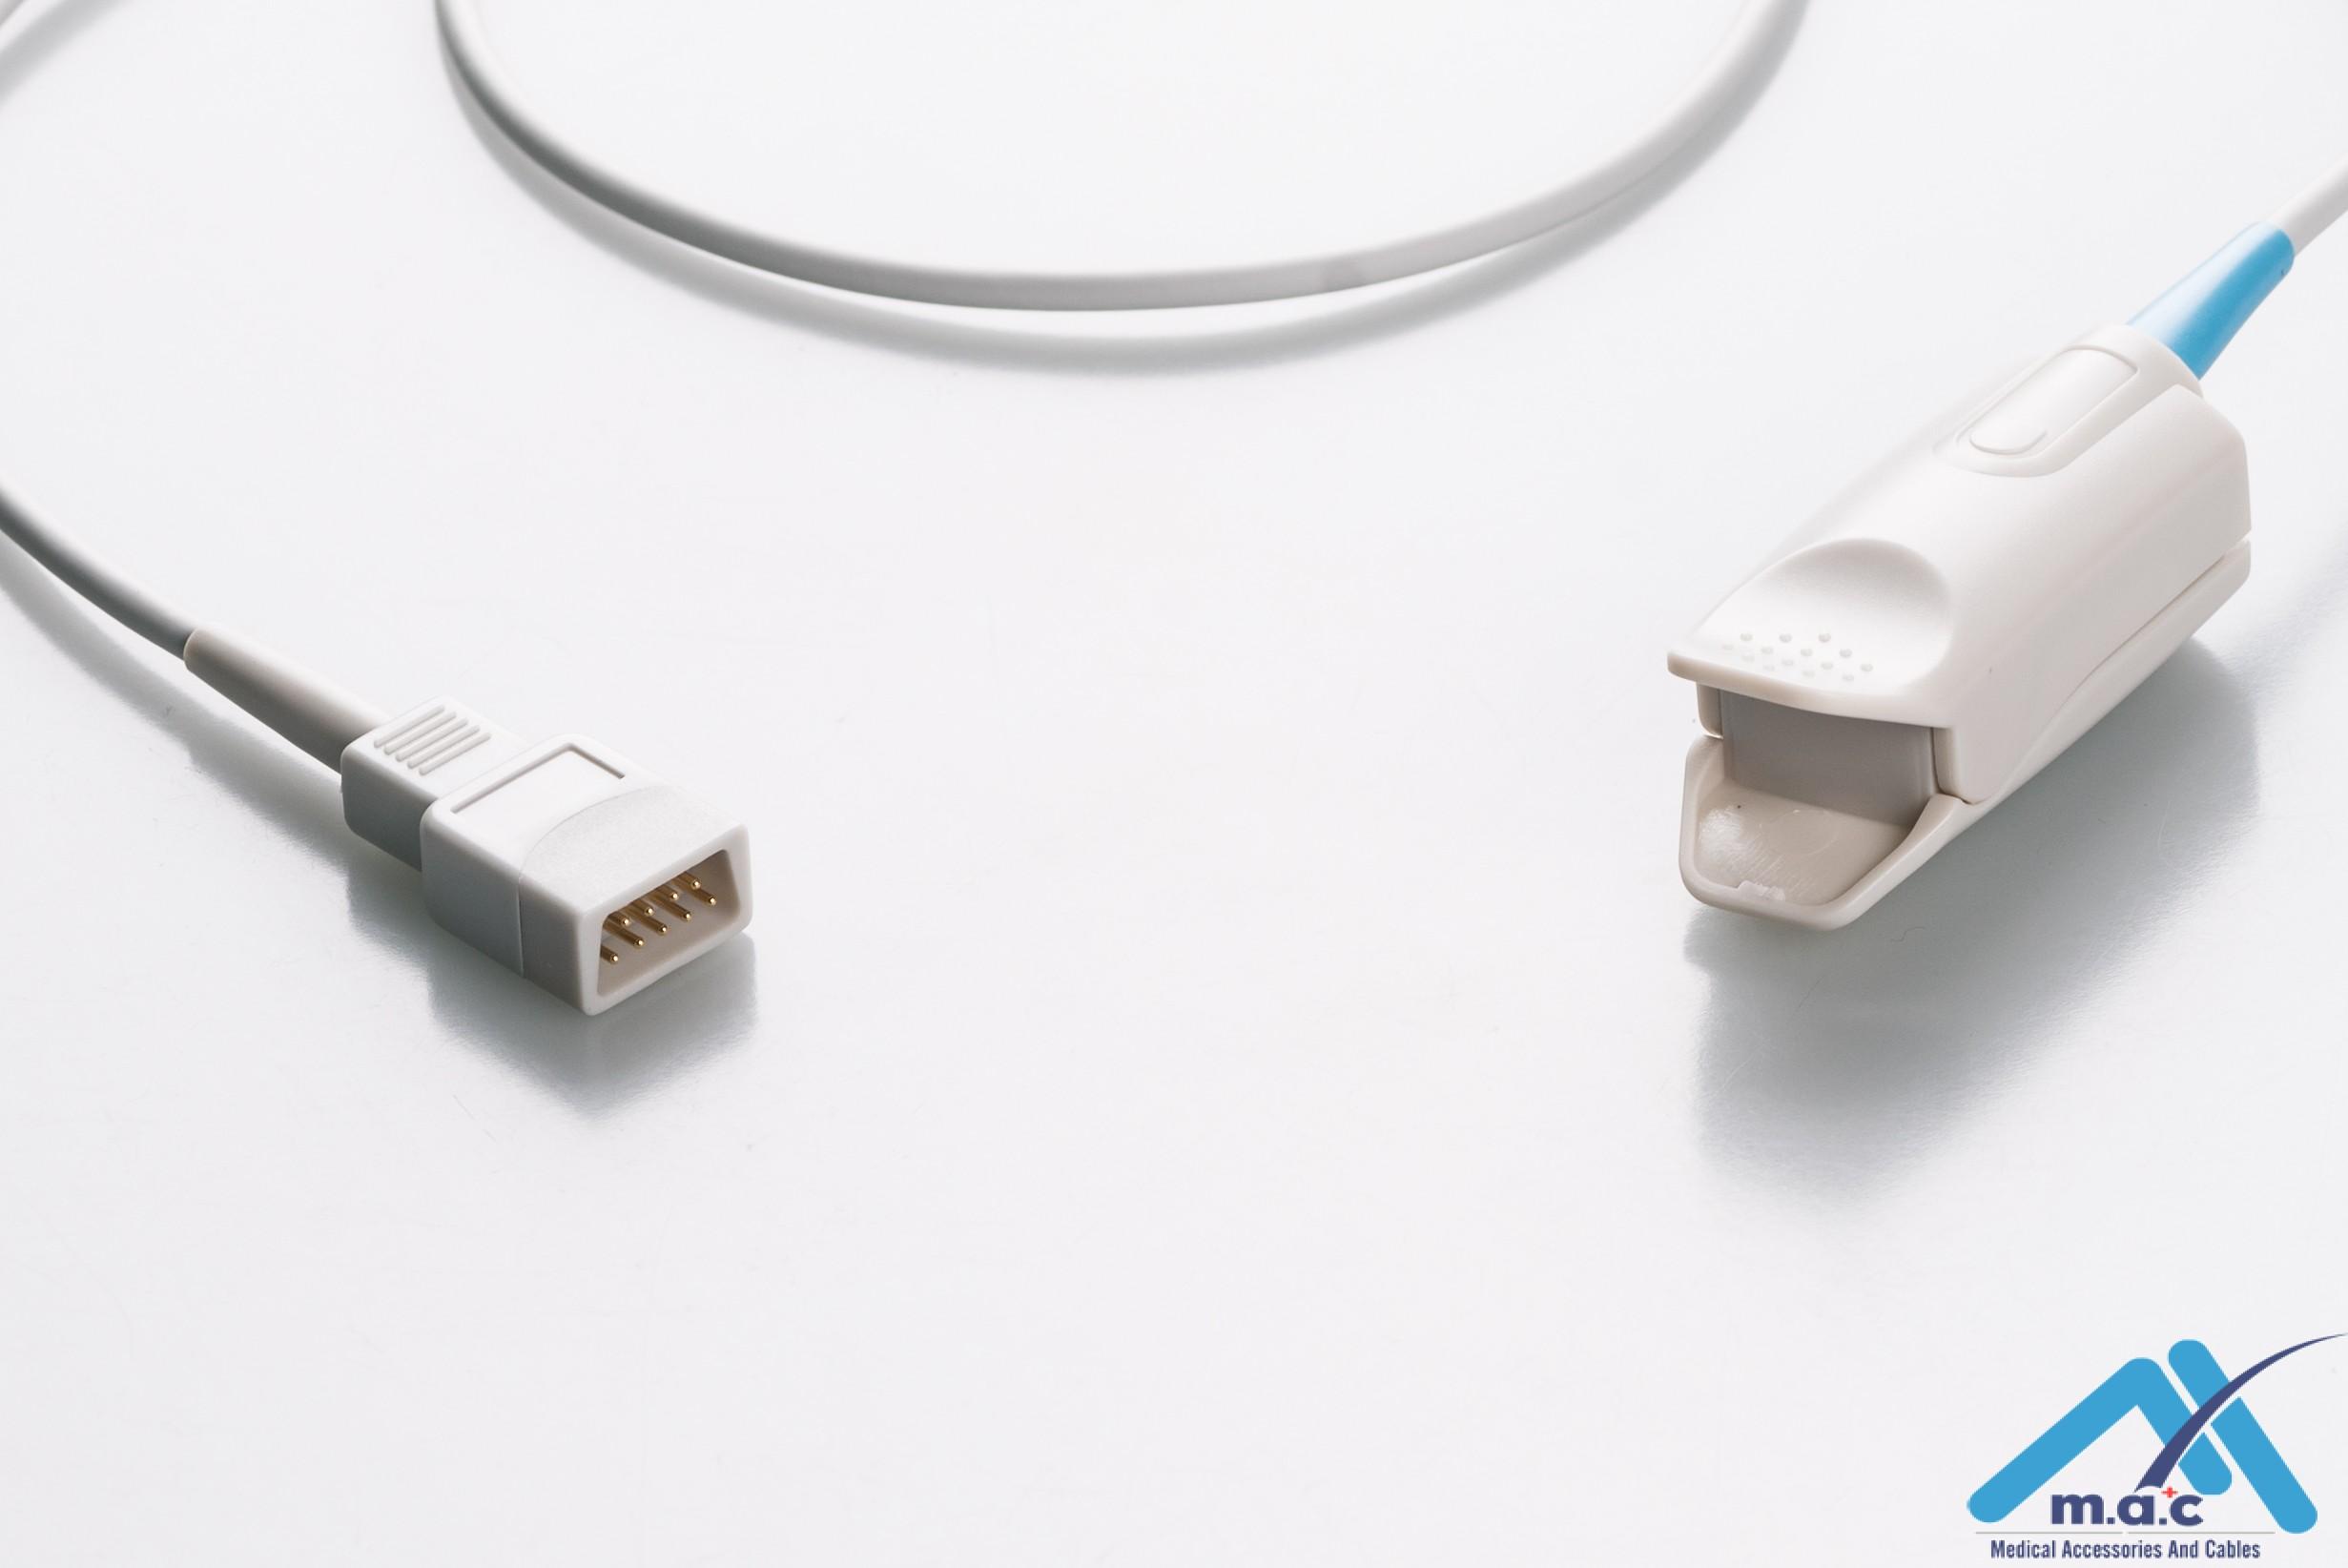 Nonin Reusable Spo2 Sensor U4M03-08